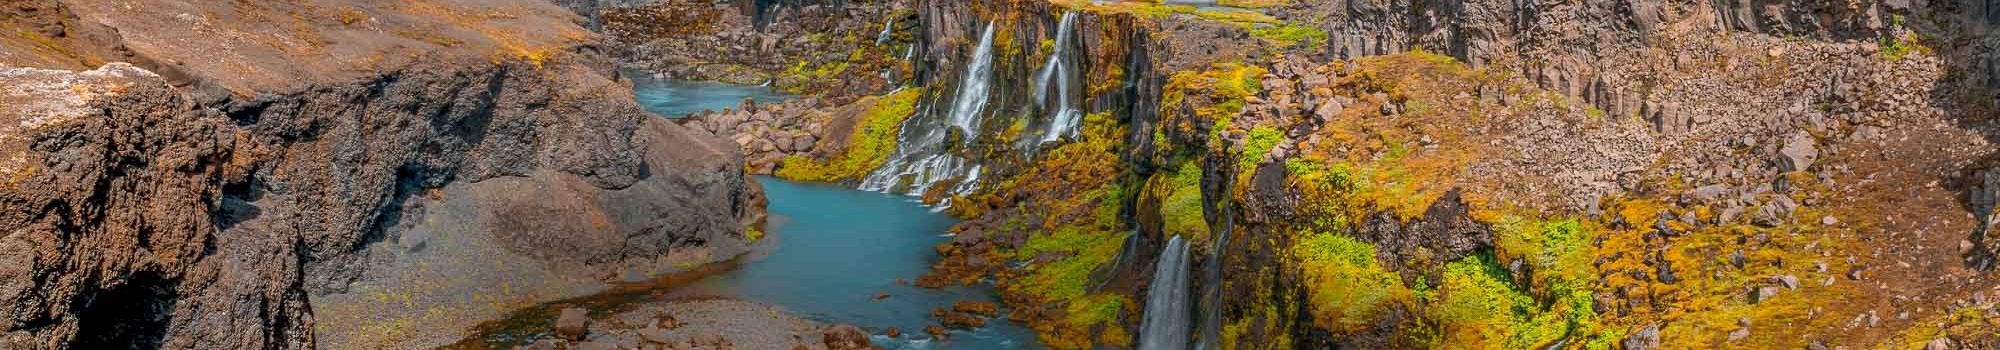 Sigoldugljufur Canyon